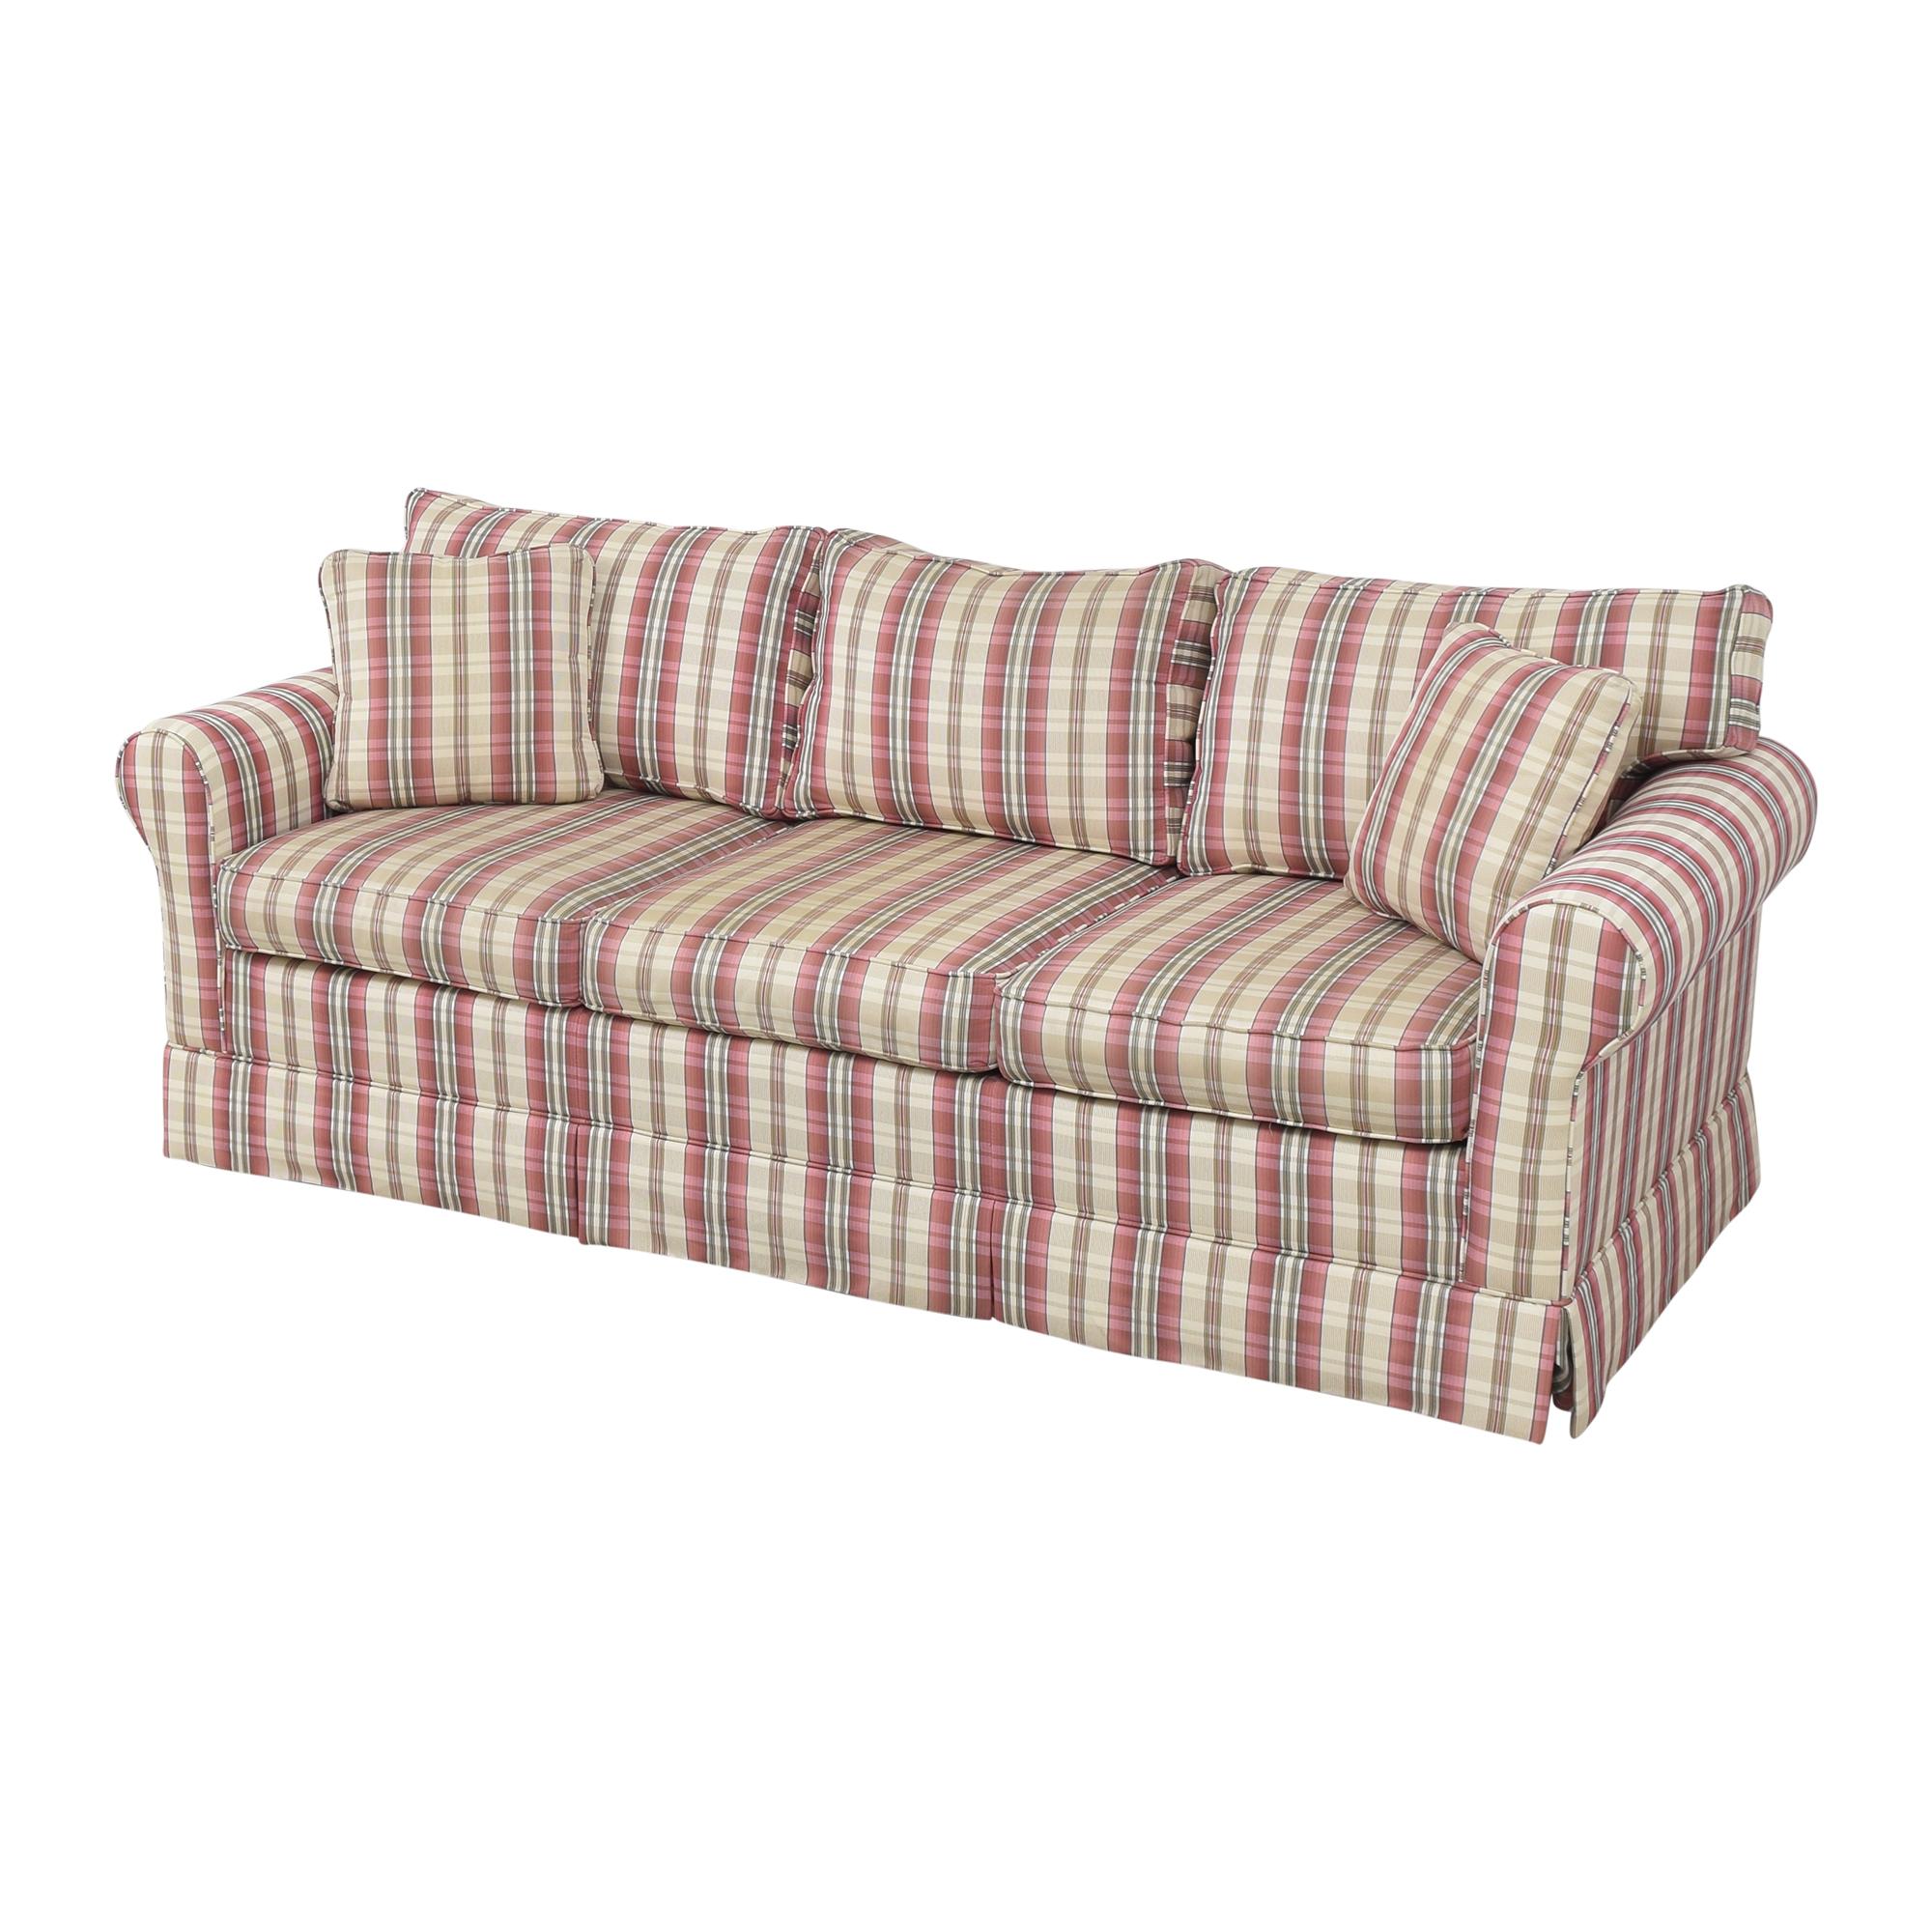 Choice Seating Gallery Skirted Three Cushion Sofa Choice Seating Gallery